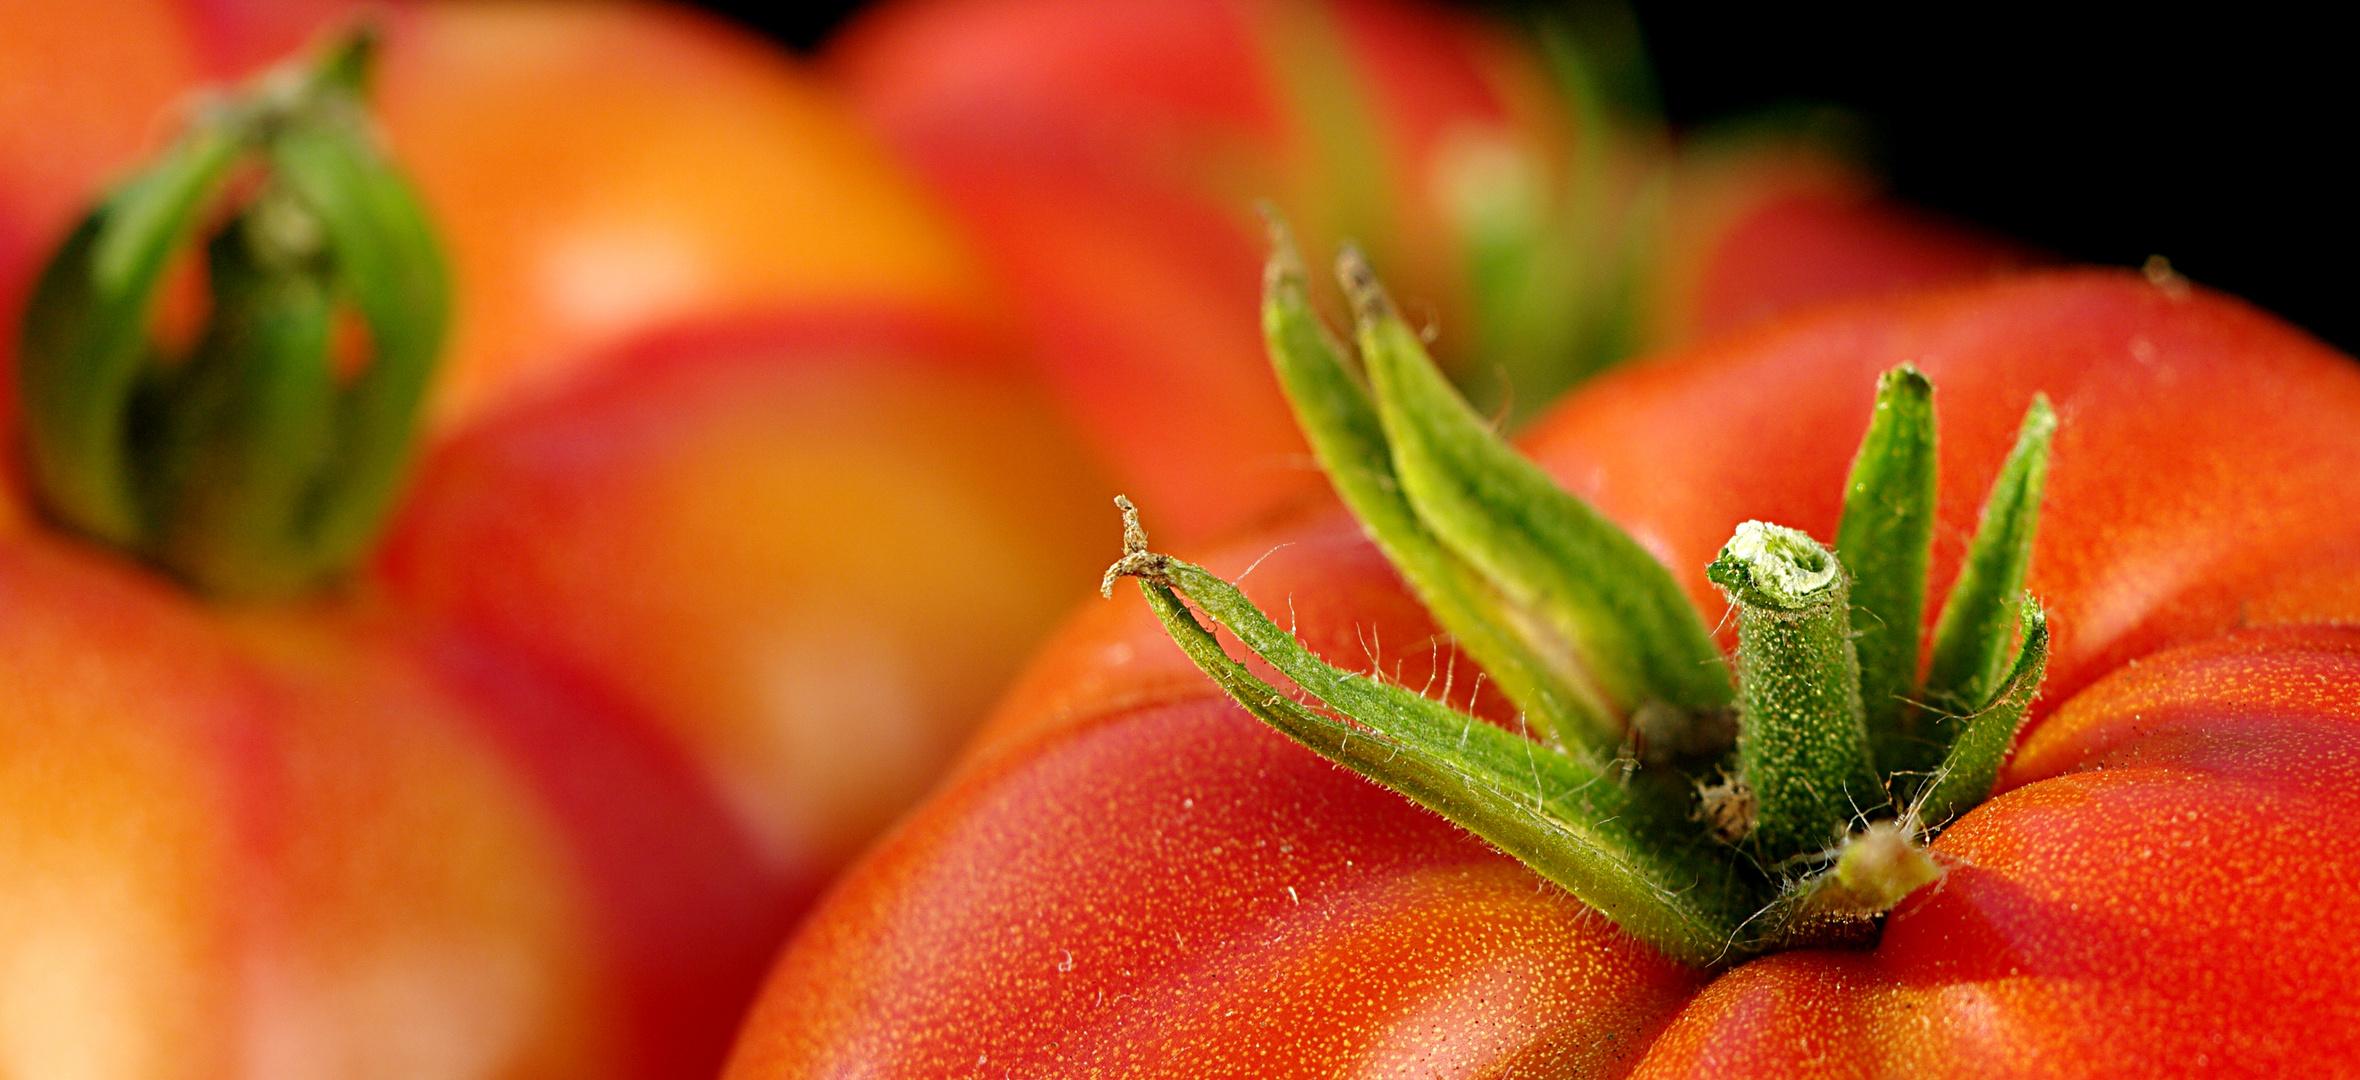 tomate russian 117 foto bild stillleben essen trinken obst gem se bilder auf fotocommunity. Black Bedroom Furniture Sets. Home Design Ideas